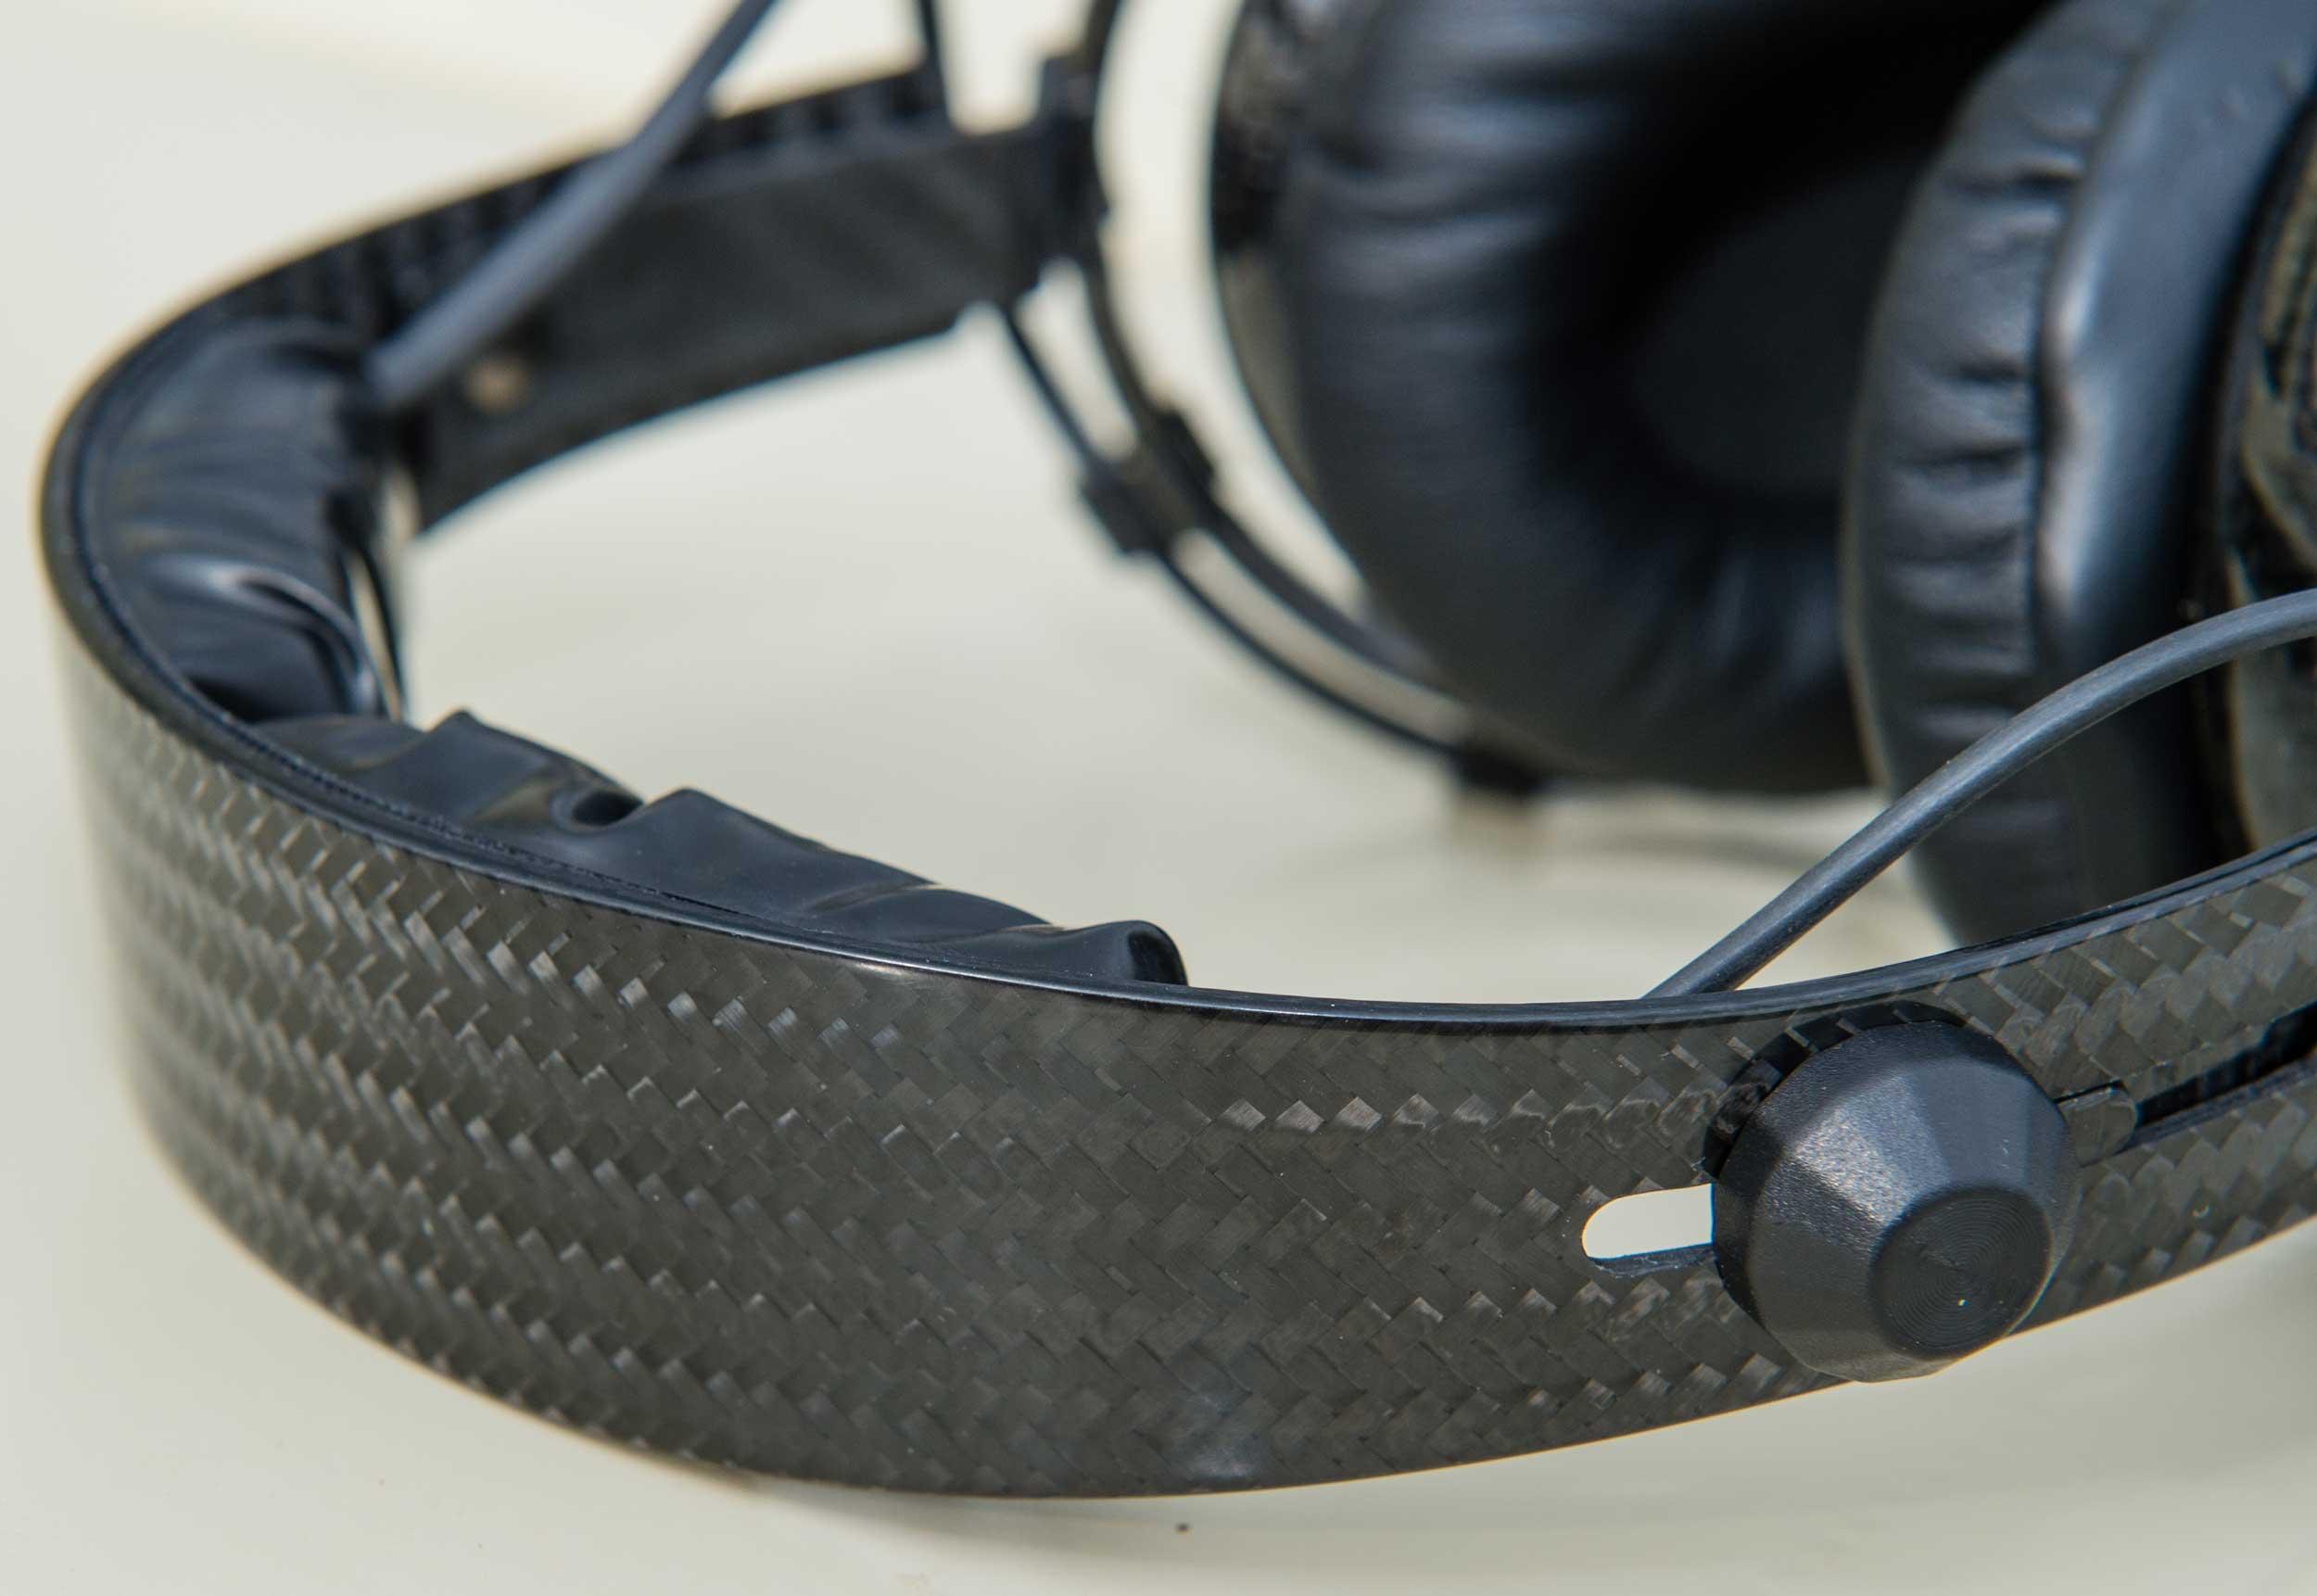 SEHT headset